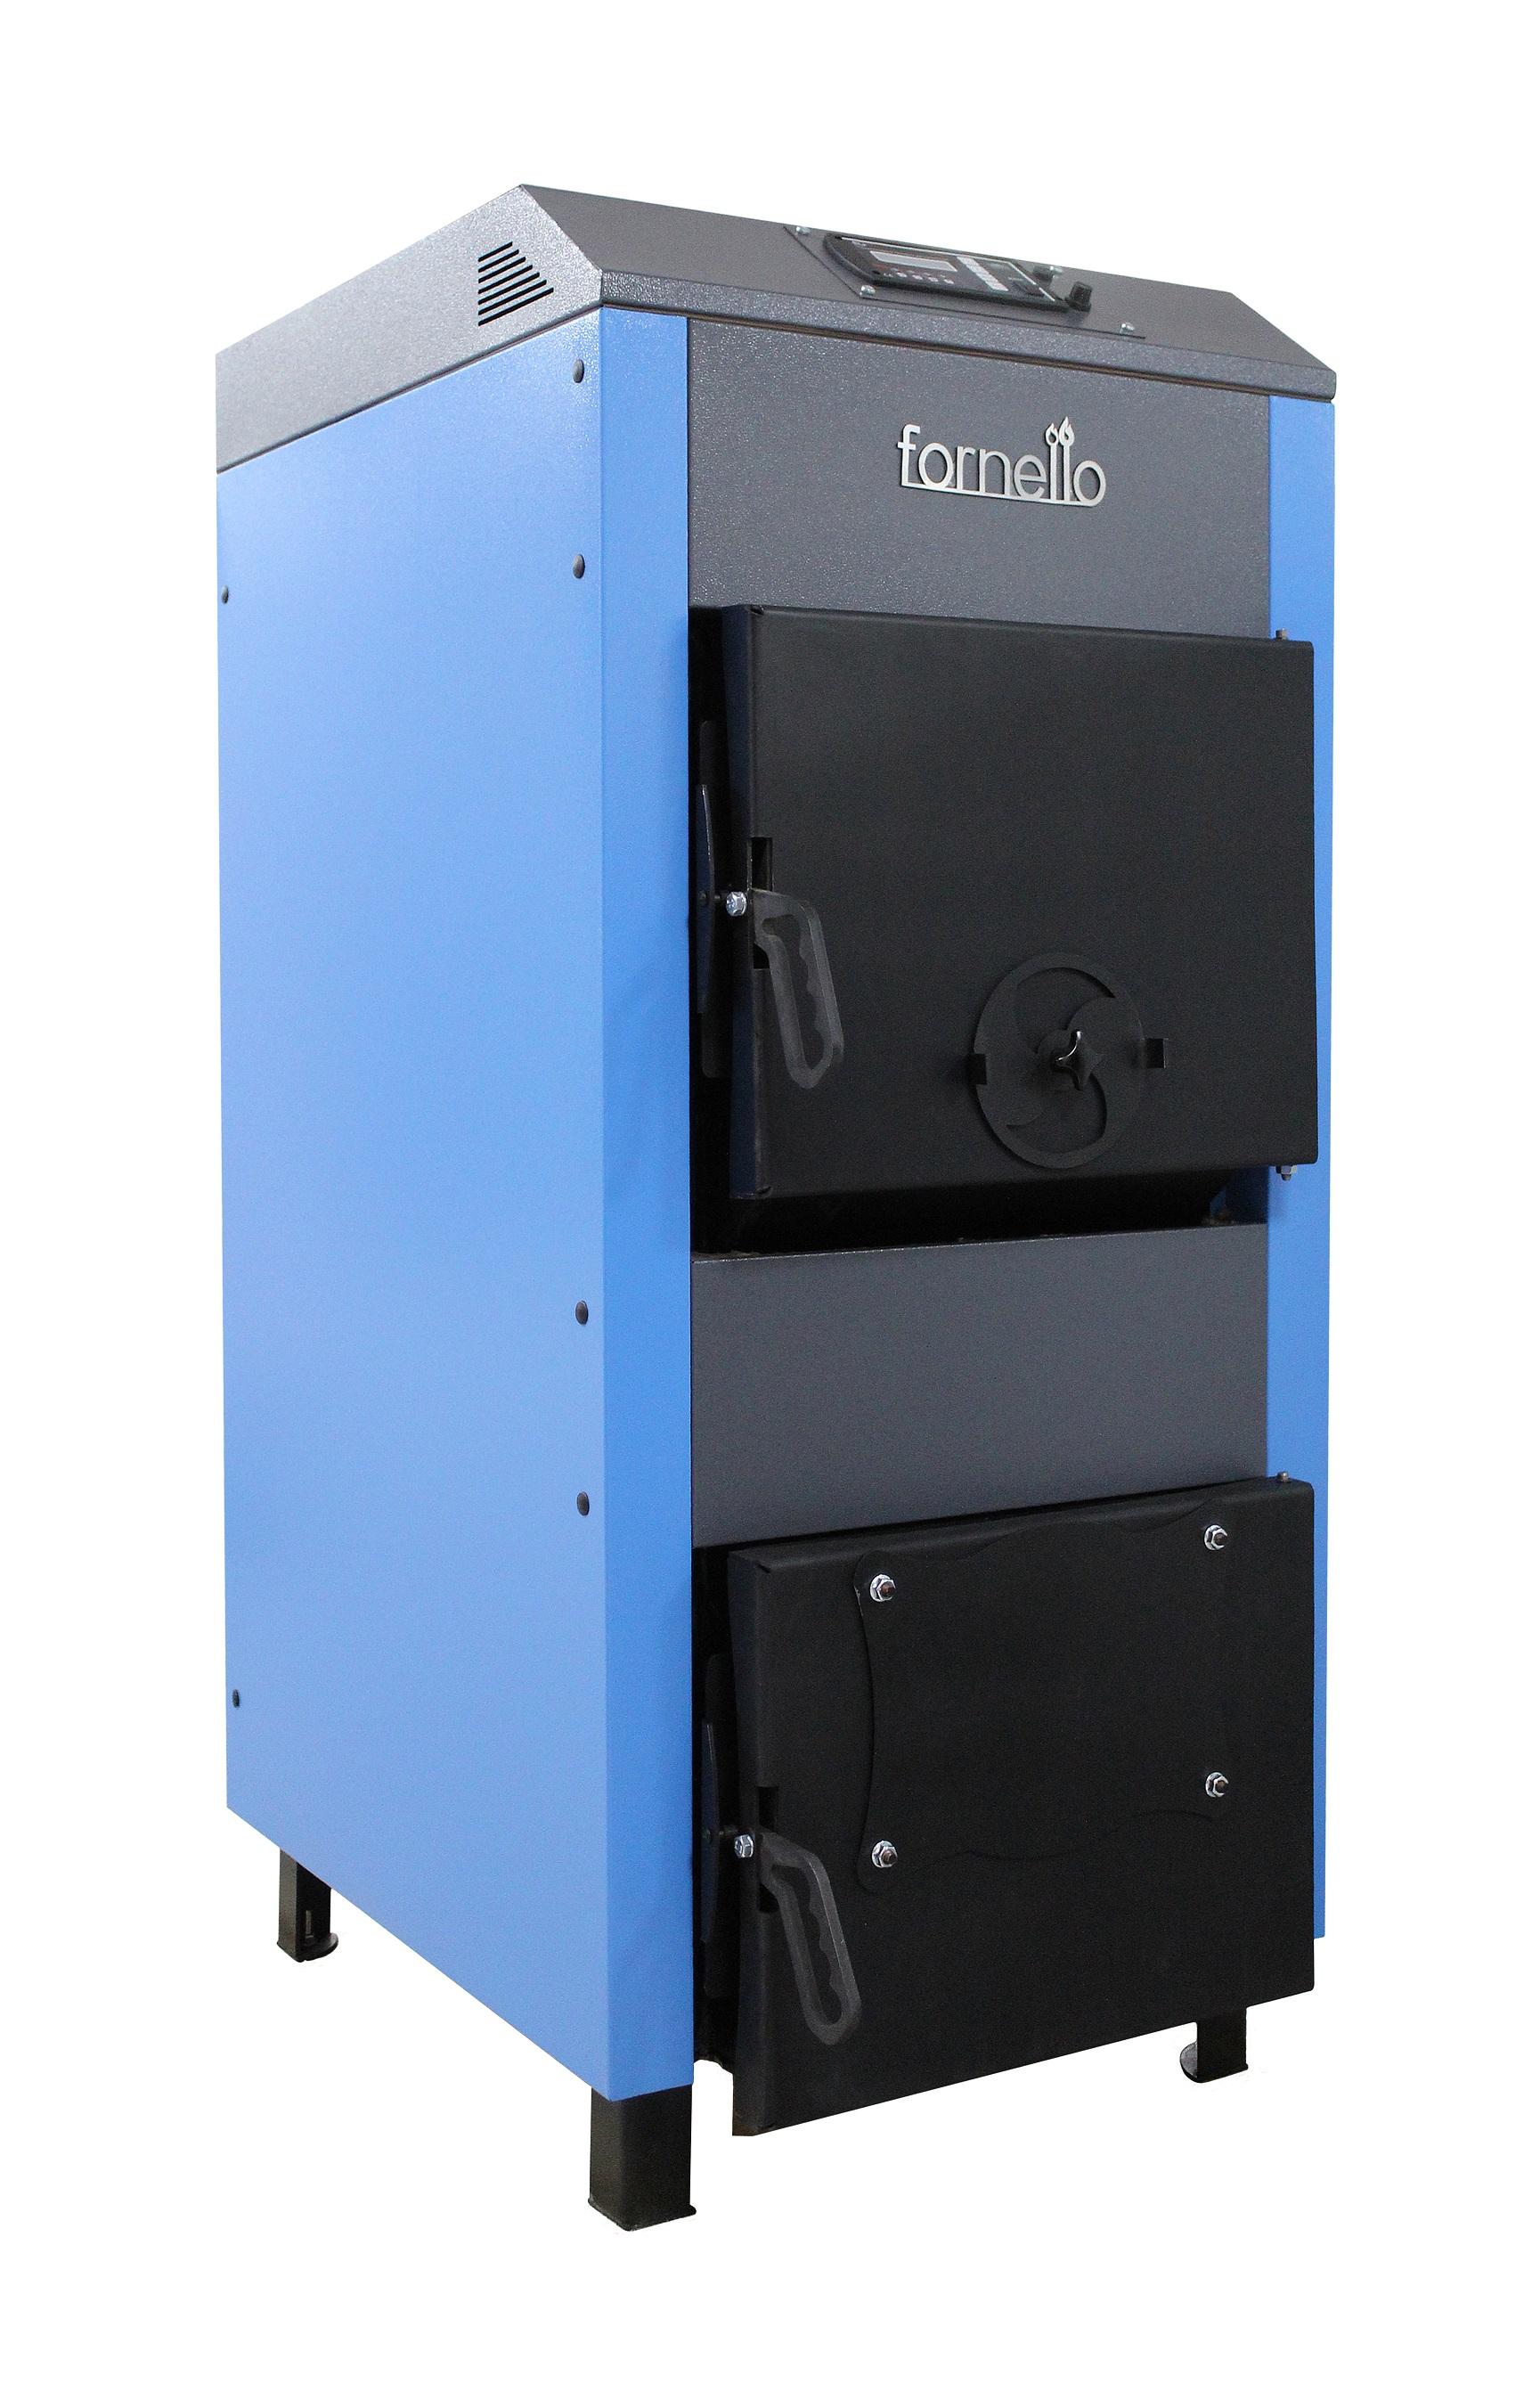 Centrala pe lemne, brichete si carbuni Fornello A 35 kW, cu ventilator si automatizare, serpentina de racire si flansa pentru arzator cu peleti fornello imagine